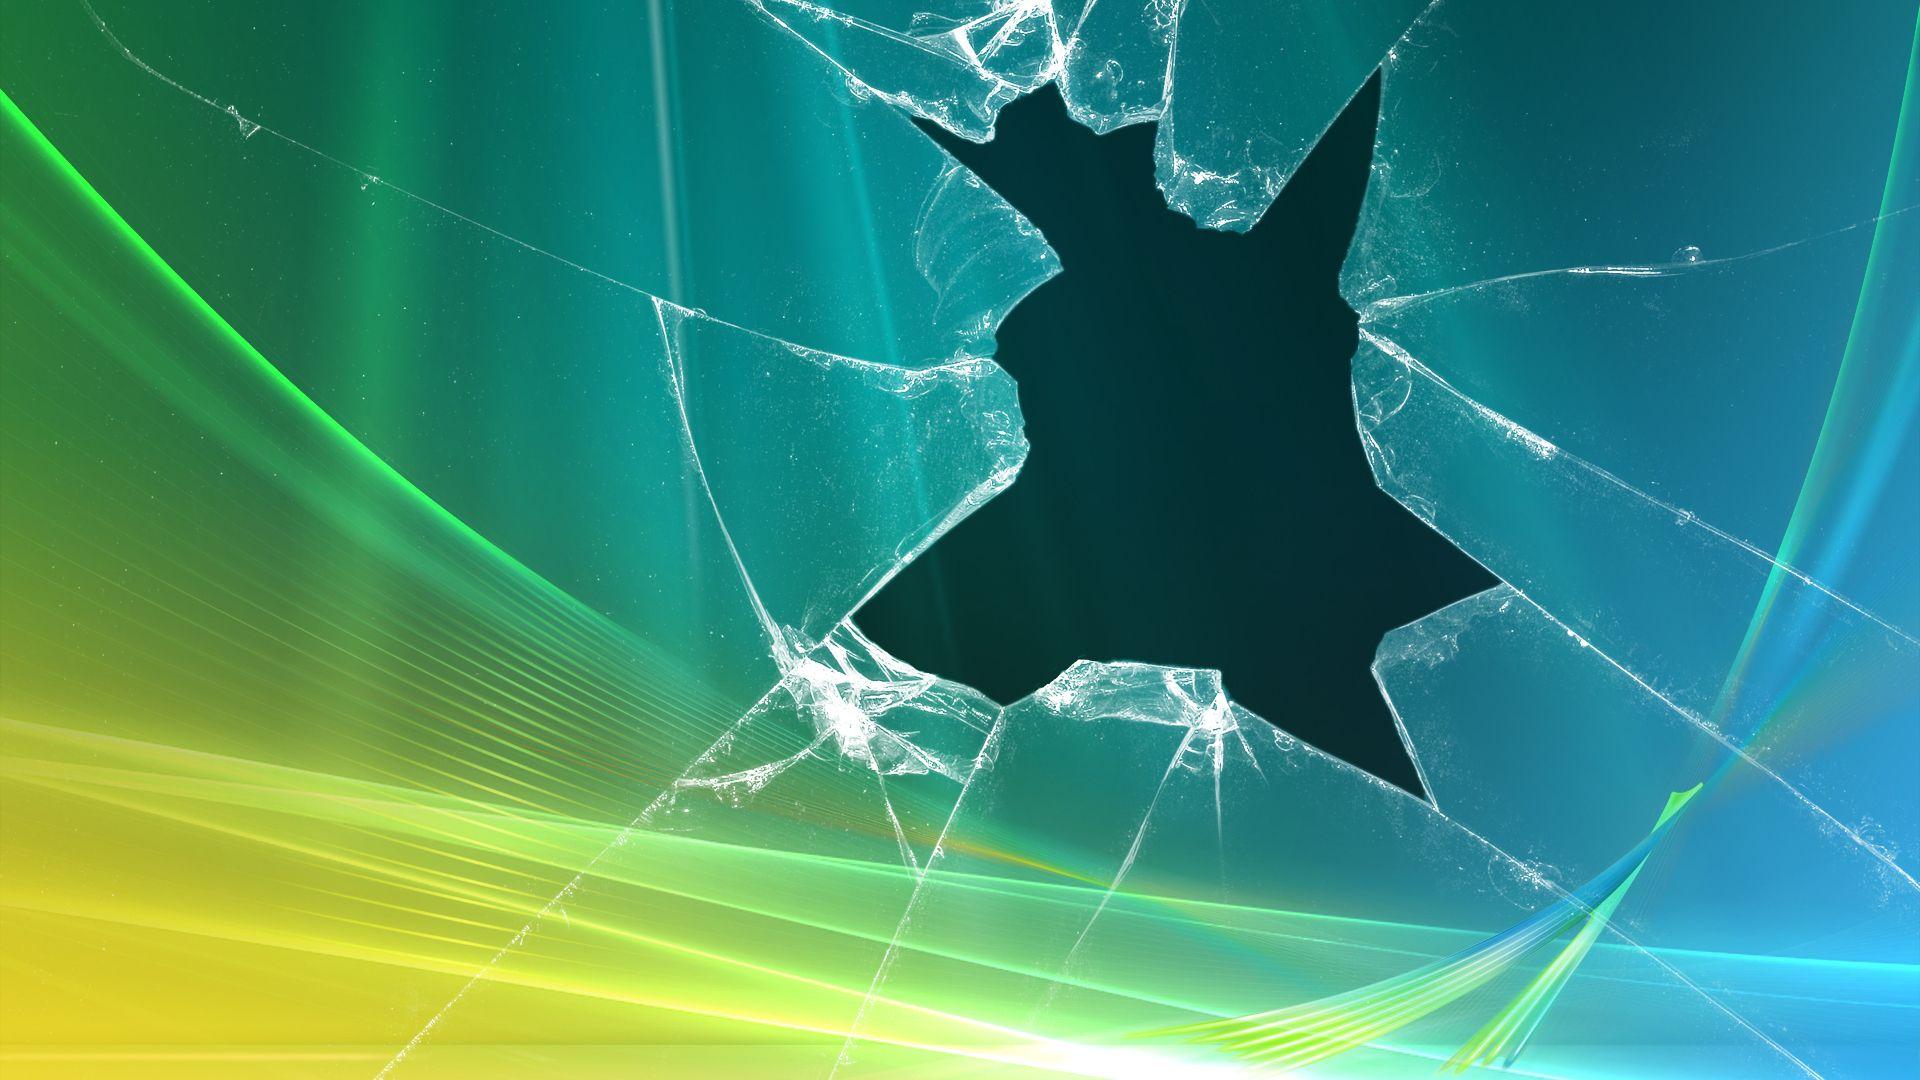 Broken Screen Free Download Wallpaper